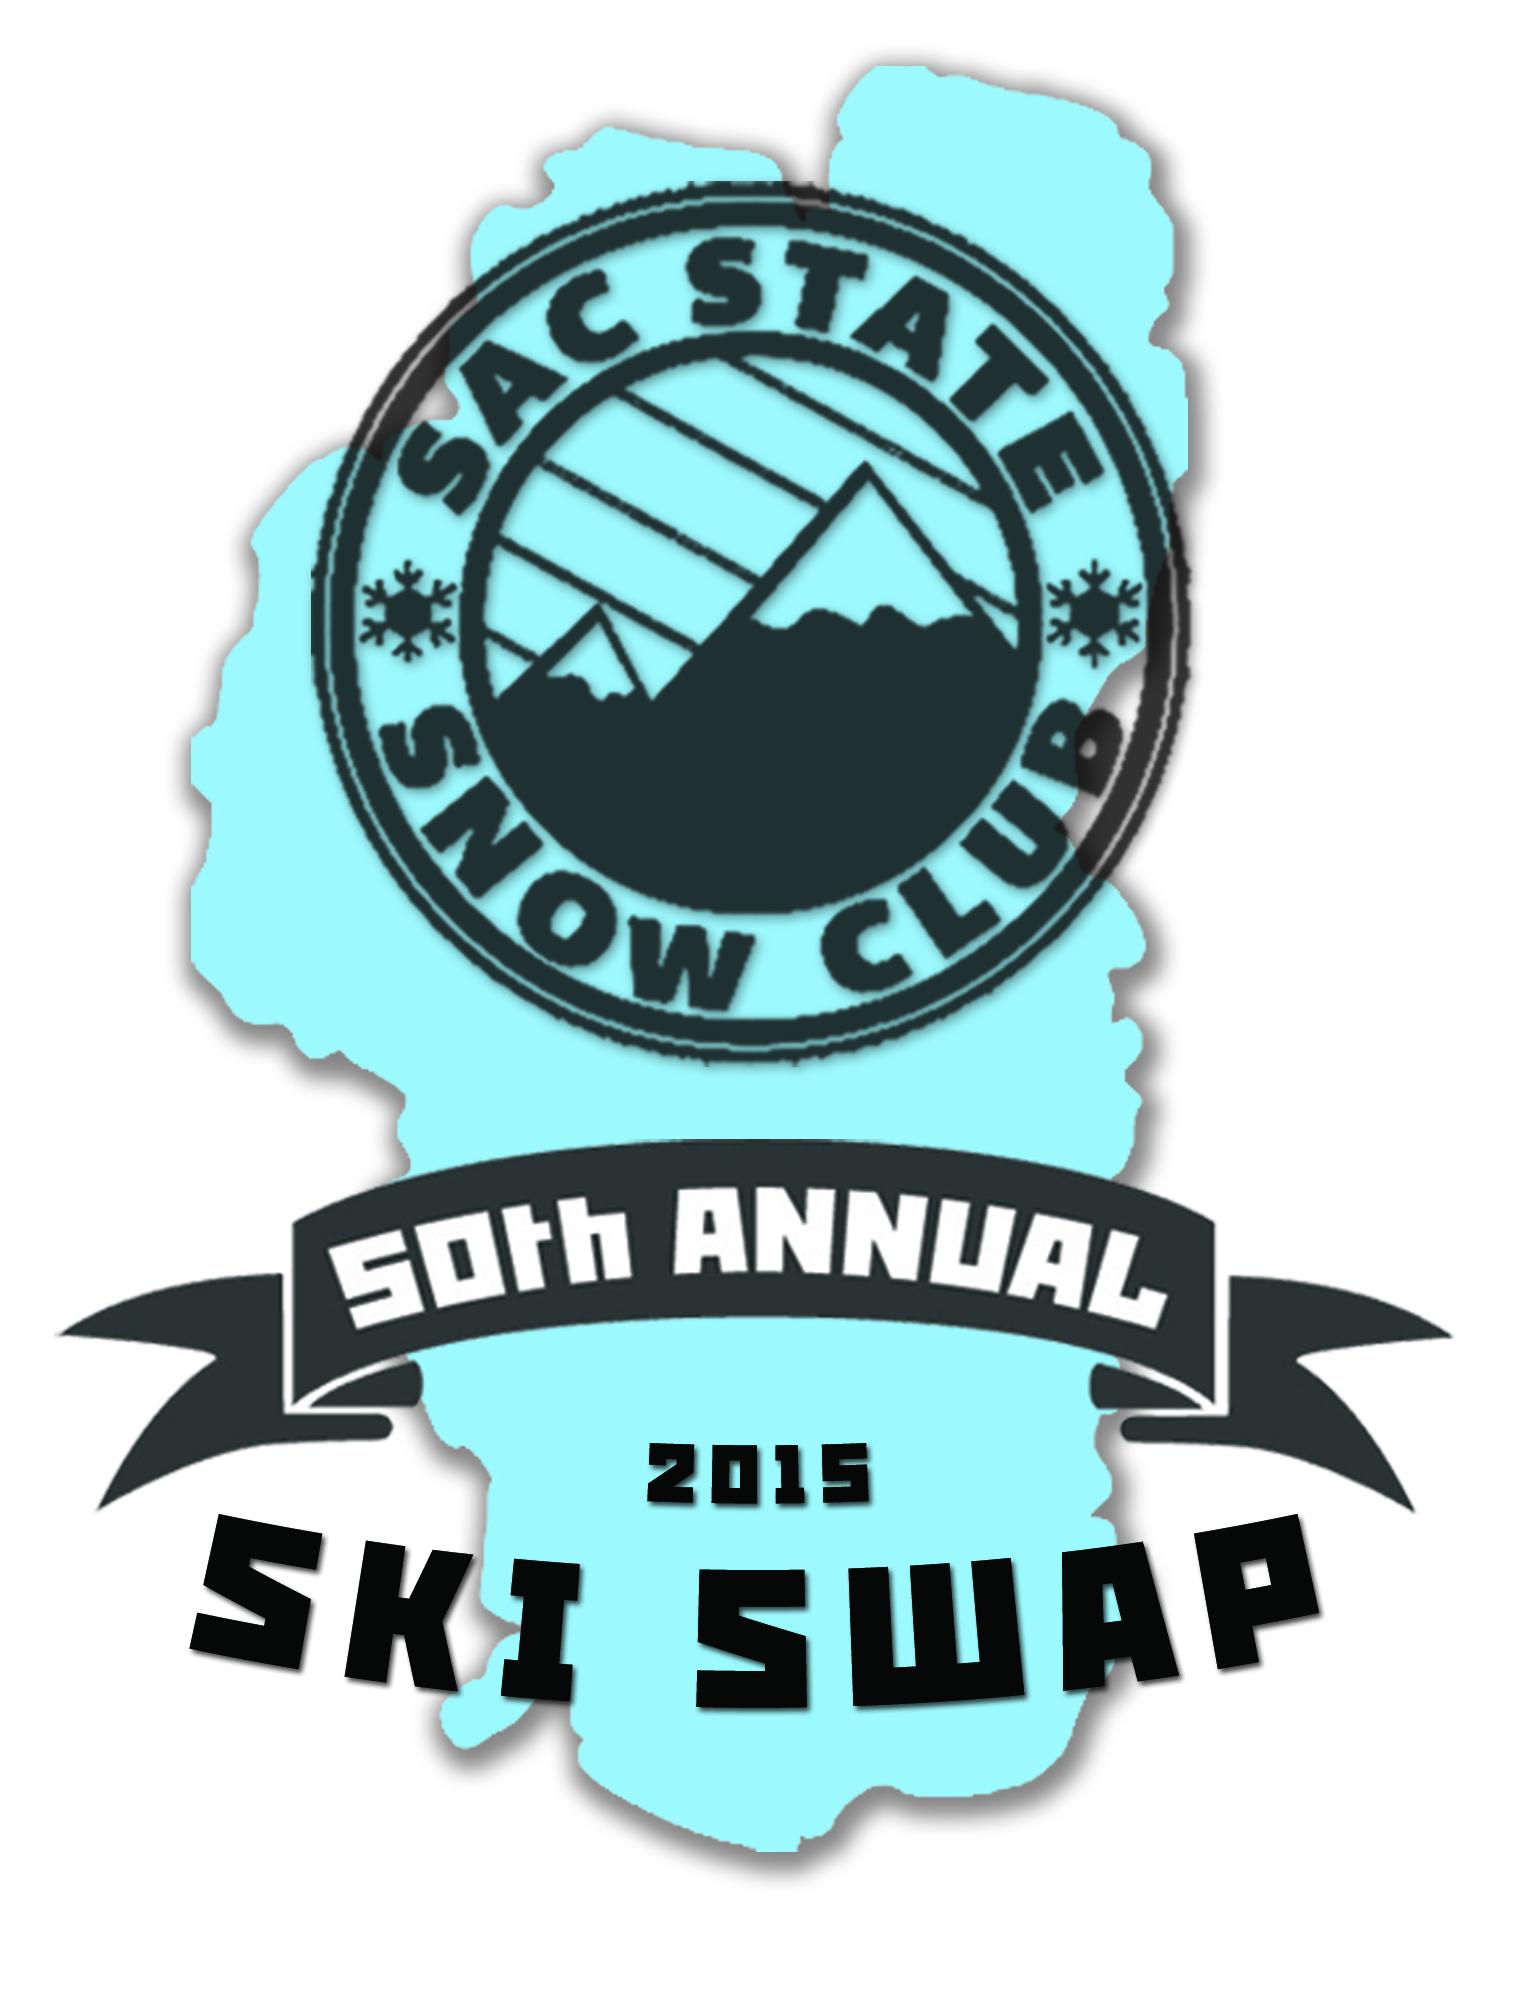 Ski Swap logo